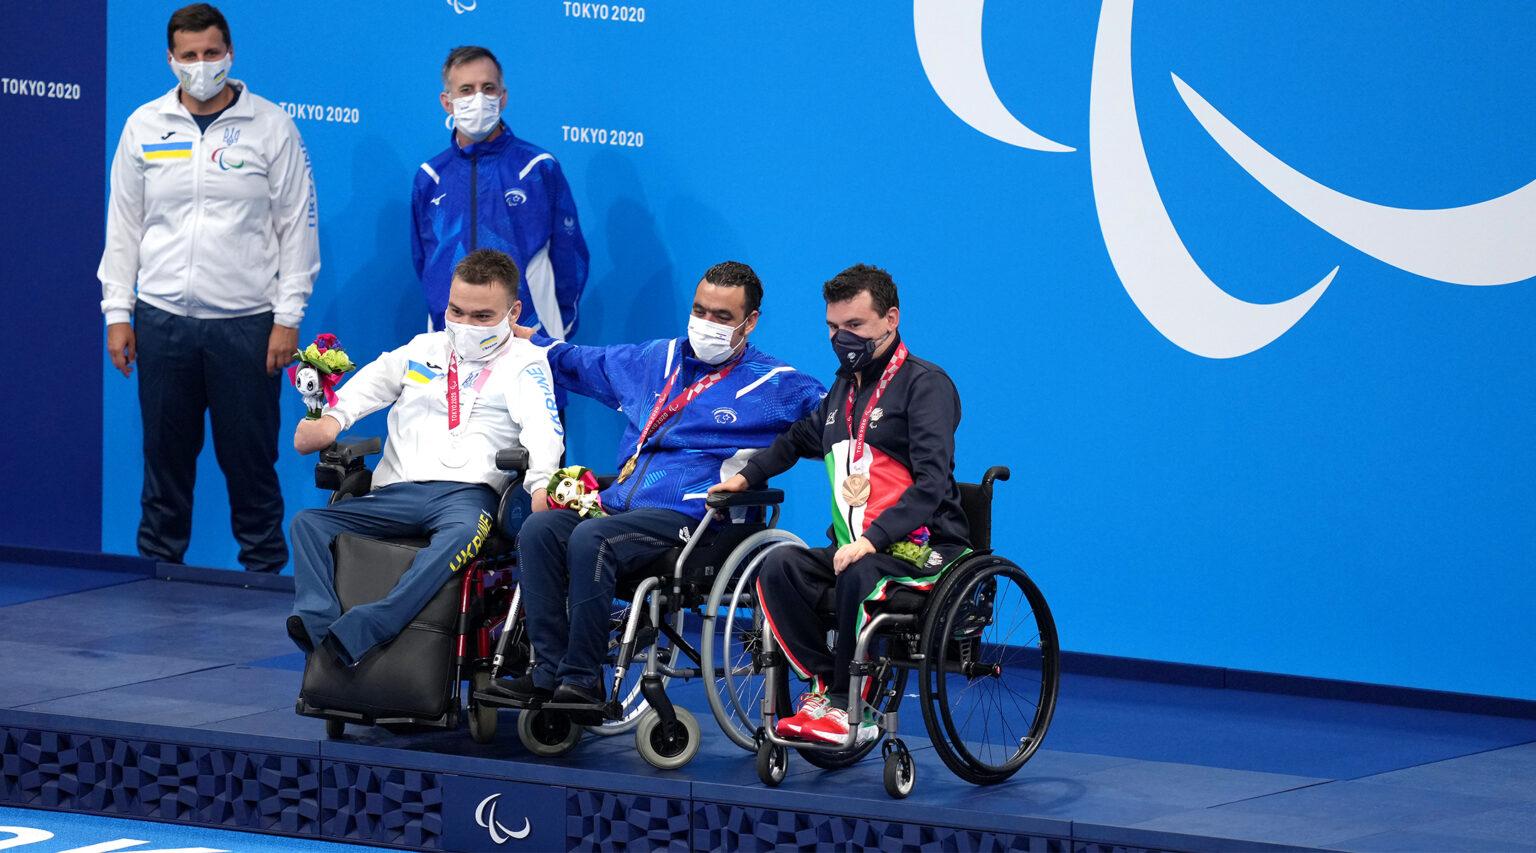 Israel's Iyad Shalabi (center) won gold in the Men's 100m Backstroke - S1 Final at the Tokyo 2020 Paralympic Games. (Photo/JTA-John Walton-PA Images via Getty Images)